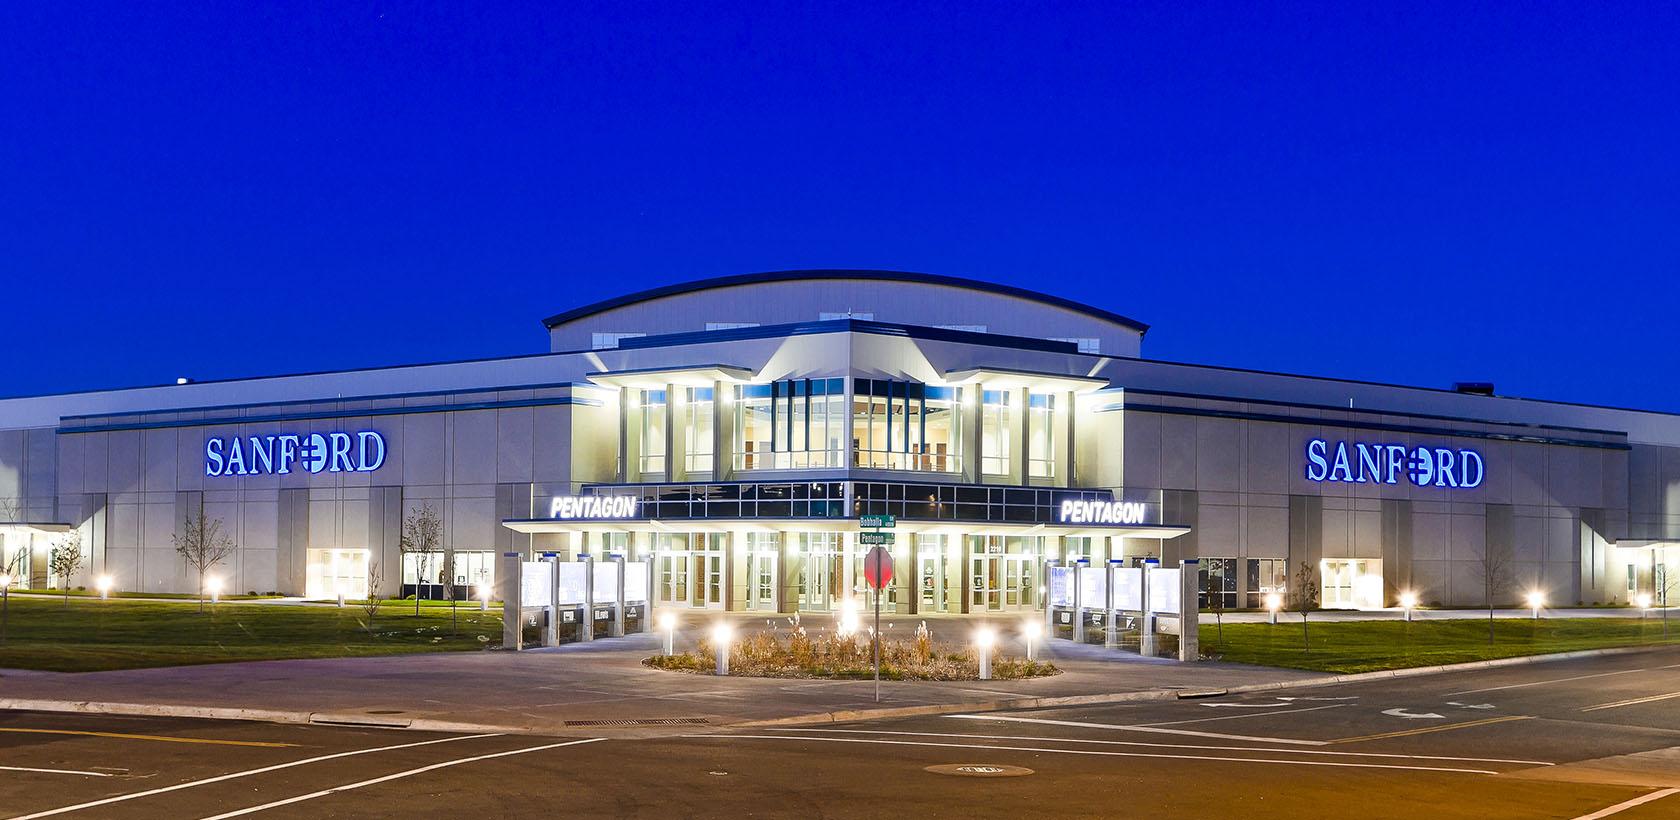 Fiegen Construction A Real Design Build Company Sioux Falls Sd